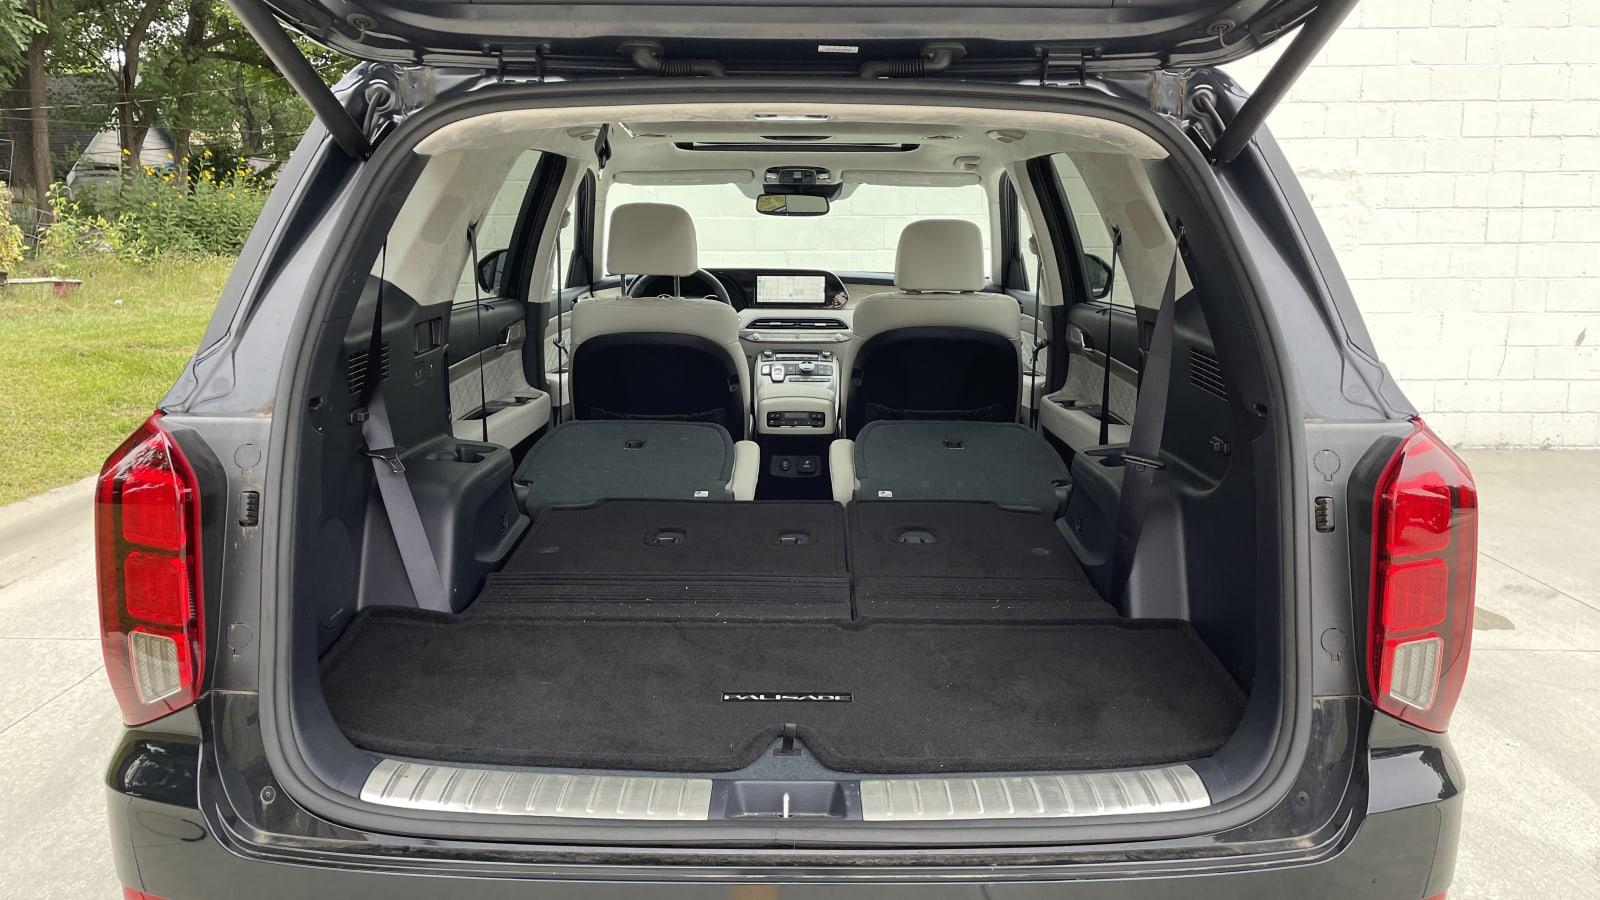 Umzug in unserem langjährigen 2021 Hyundai Palisade€